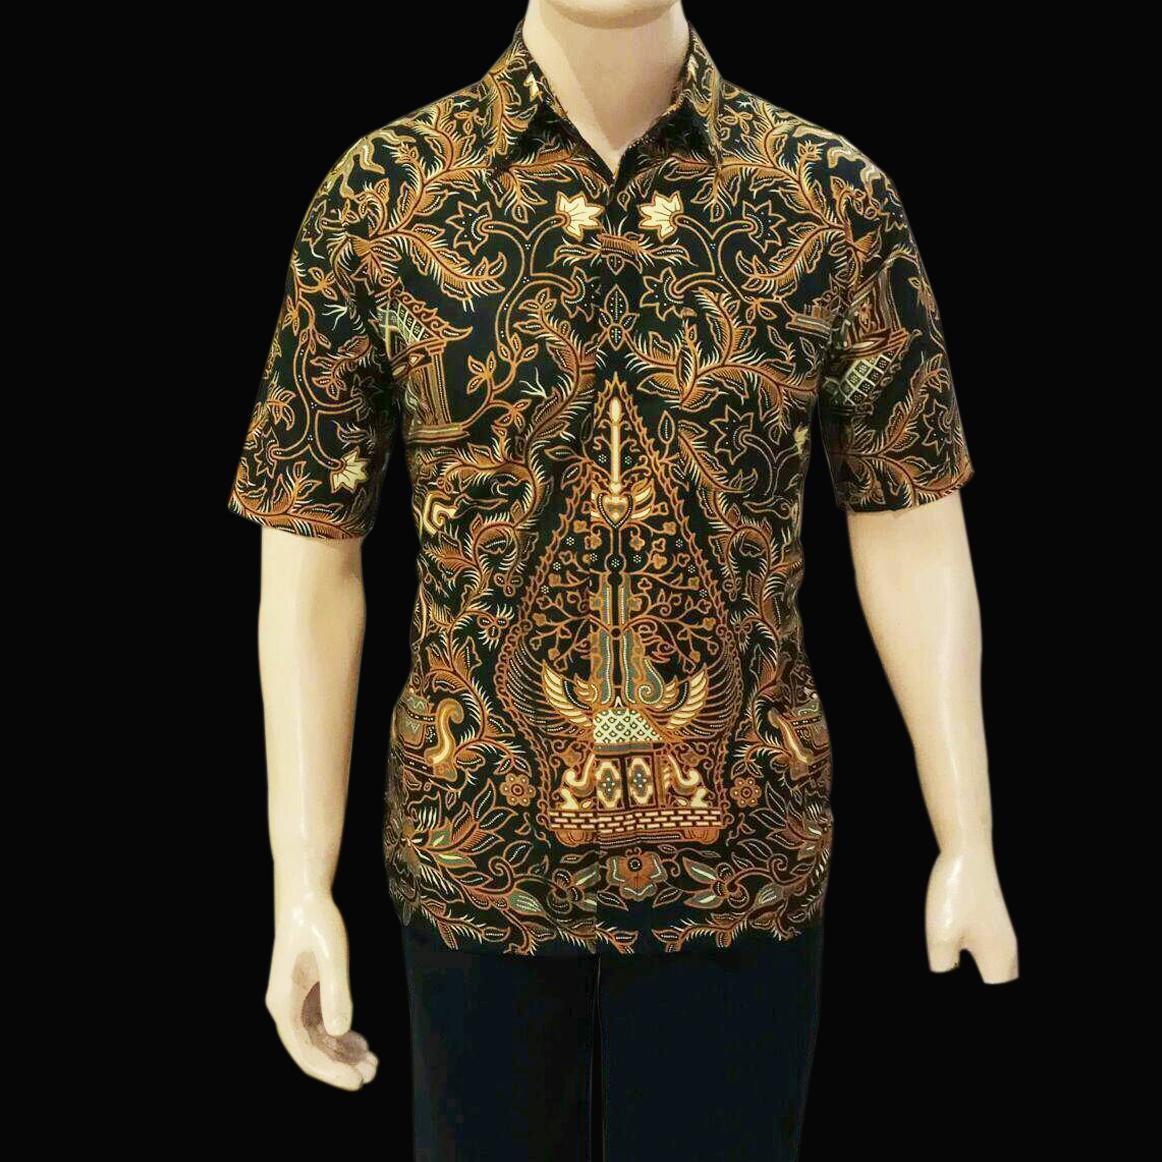 Baju Batik Pria Modern Casual | Baju Batik kantor Batik Atasan Kerja | Baju Batik Pria Modern Terbaru | Azka Batik